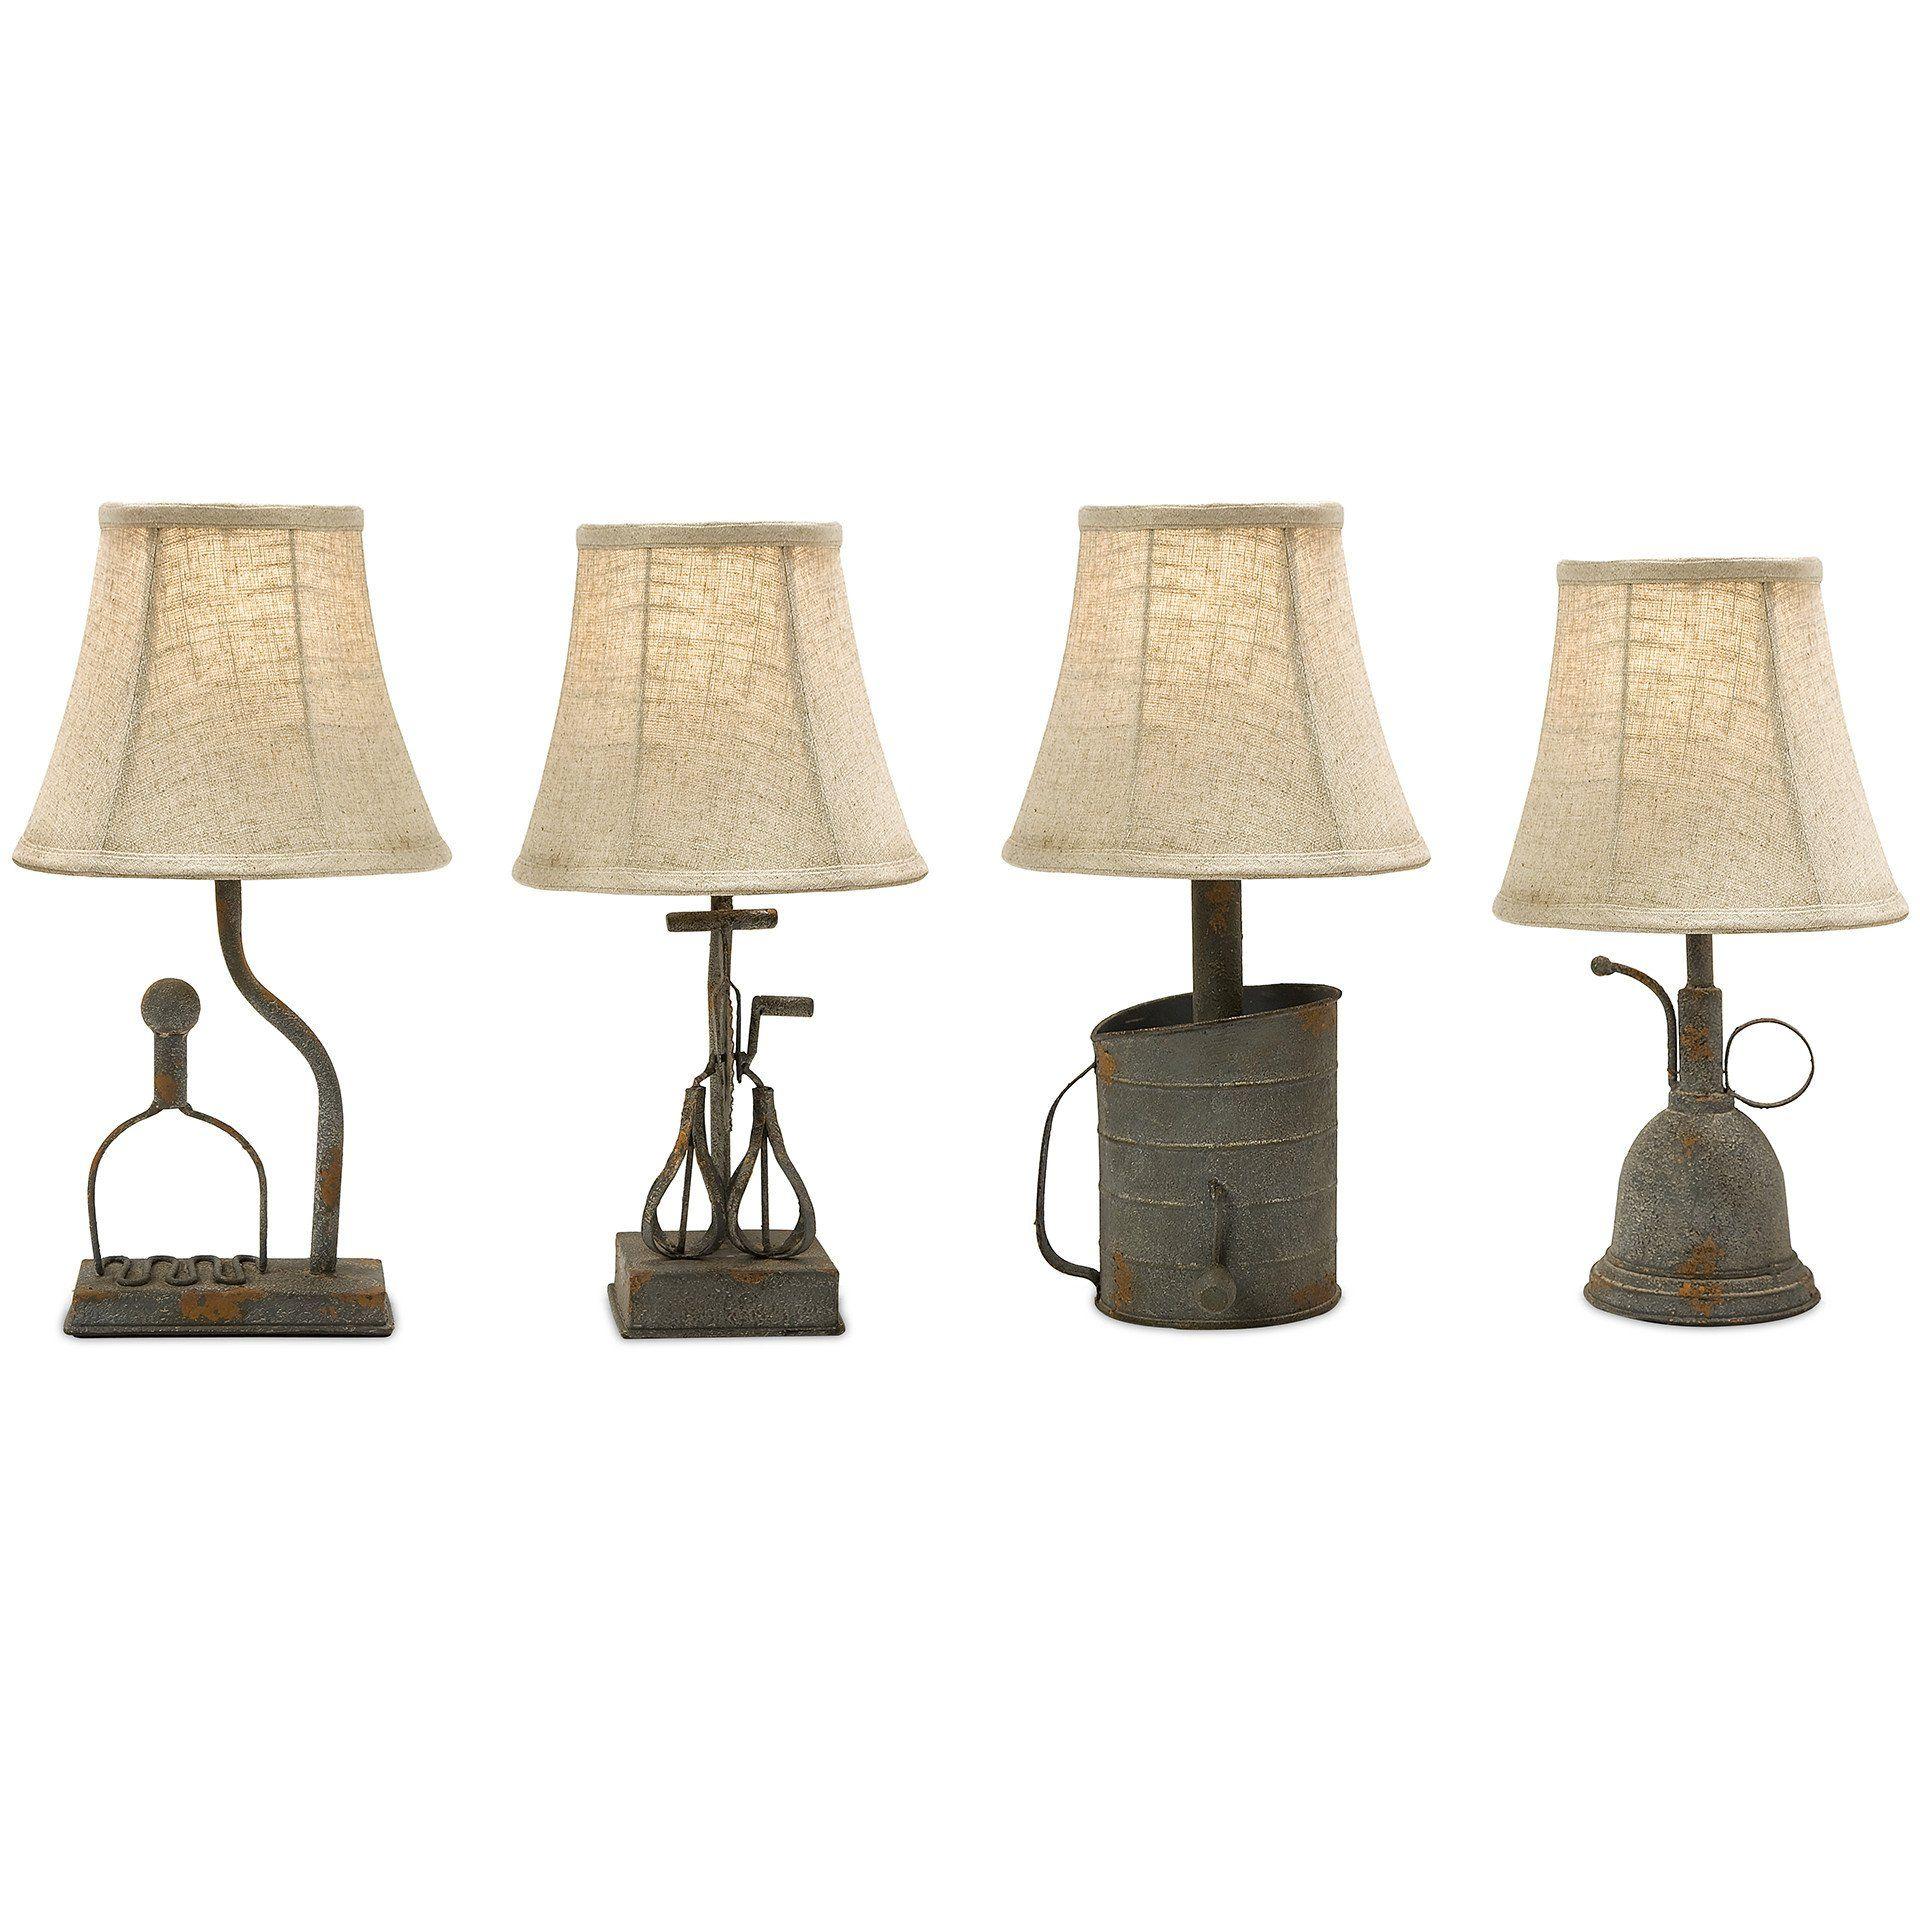 Rustic Metal Tin Can Style Farmhouse Replica Table Lamps